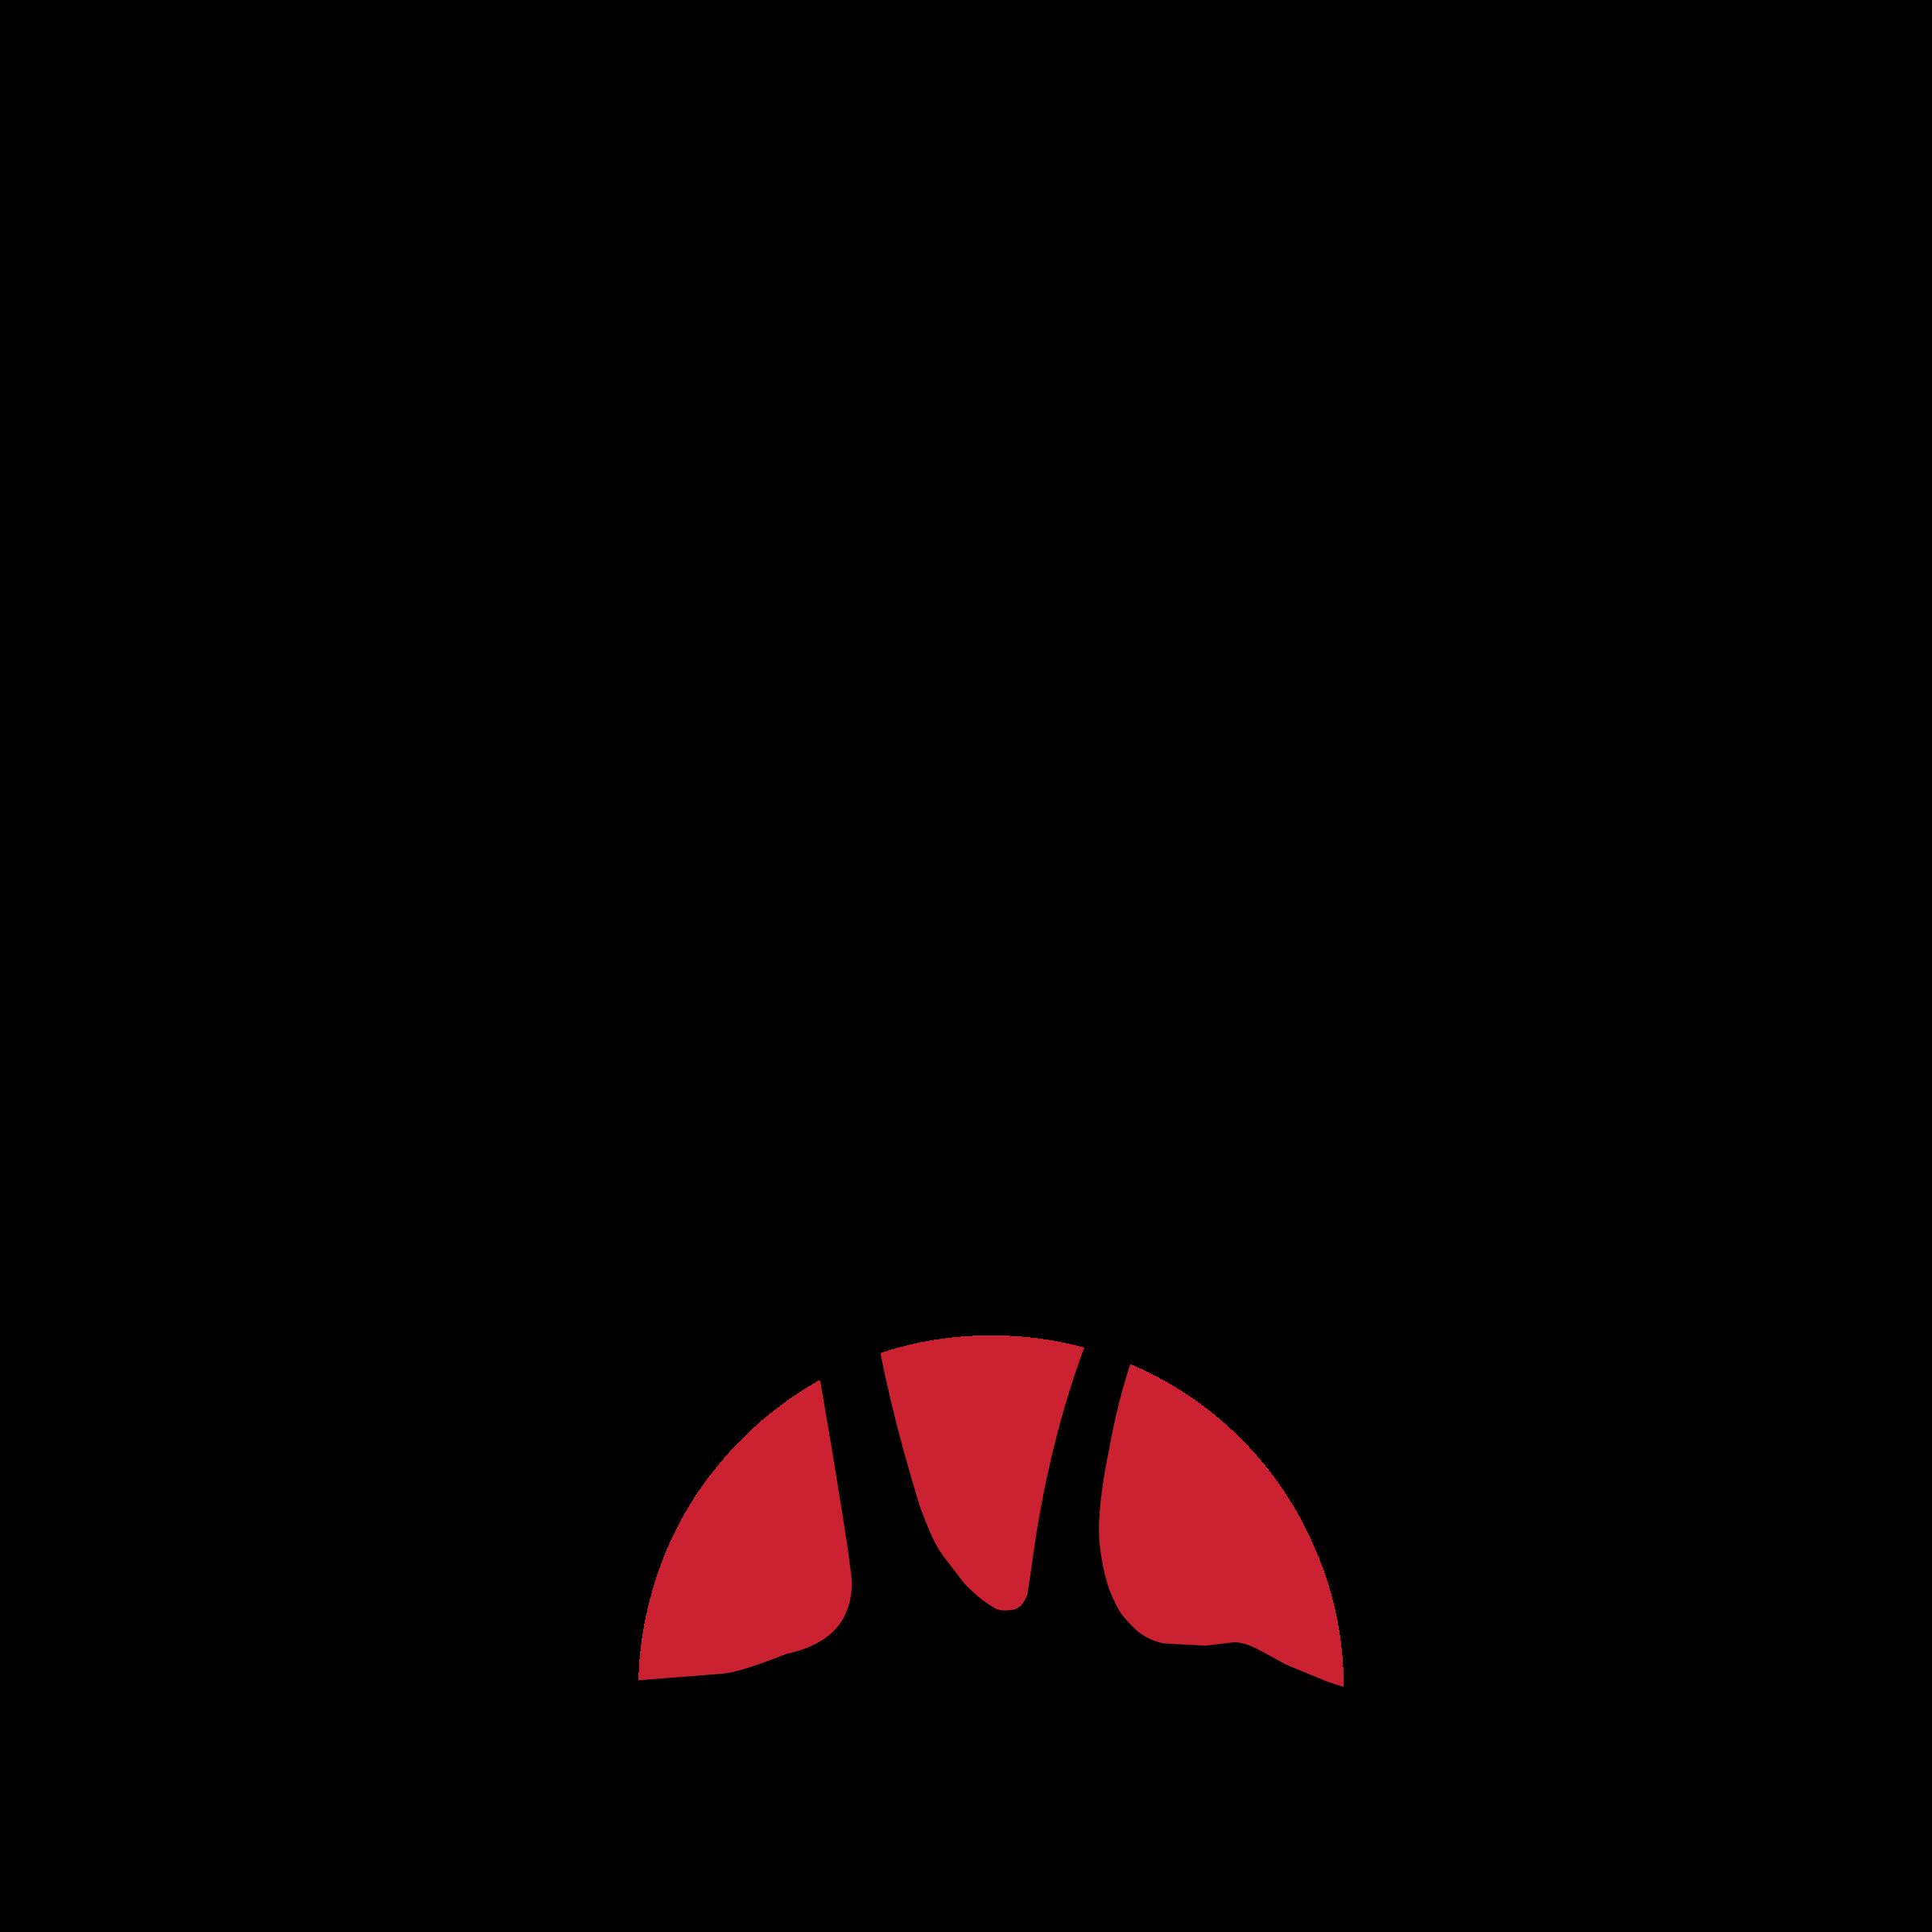 Malibu Logo PNG Transparent & SVG Vector.